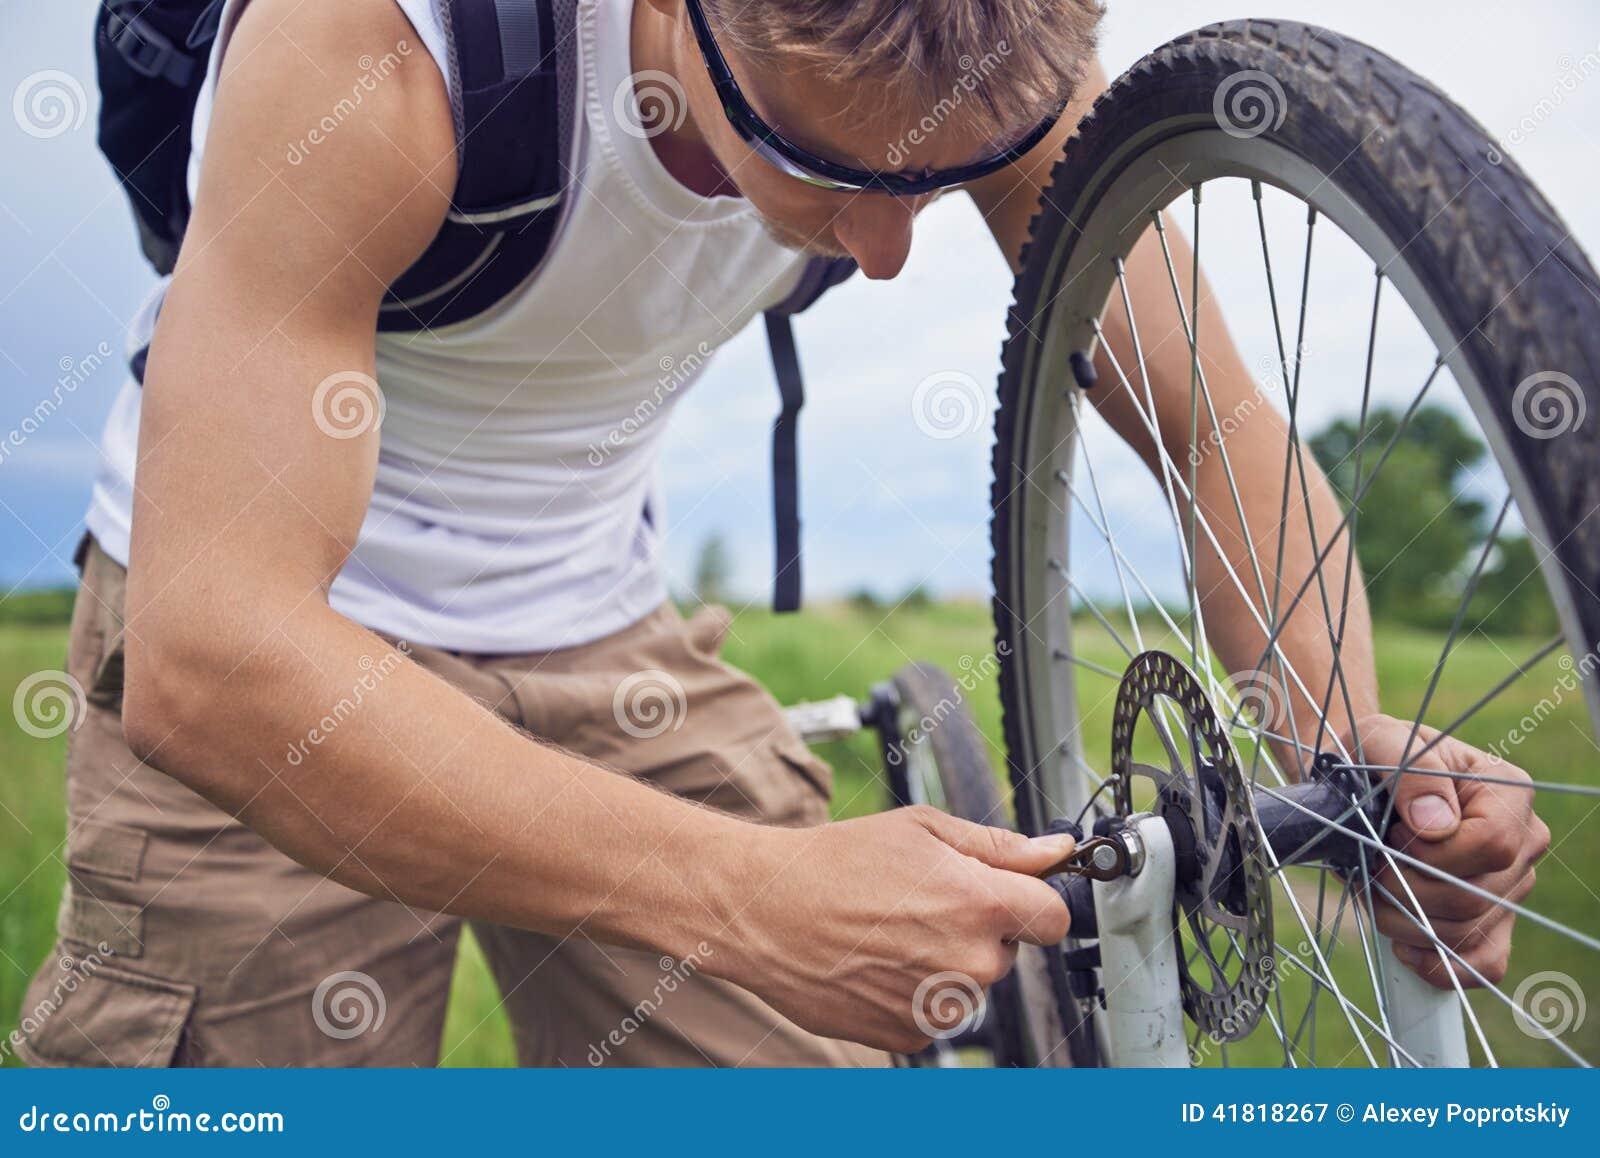 Radfahrer überprüft Bremsrad des Fahrrades